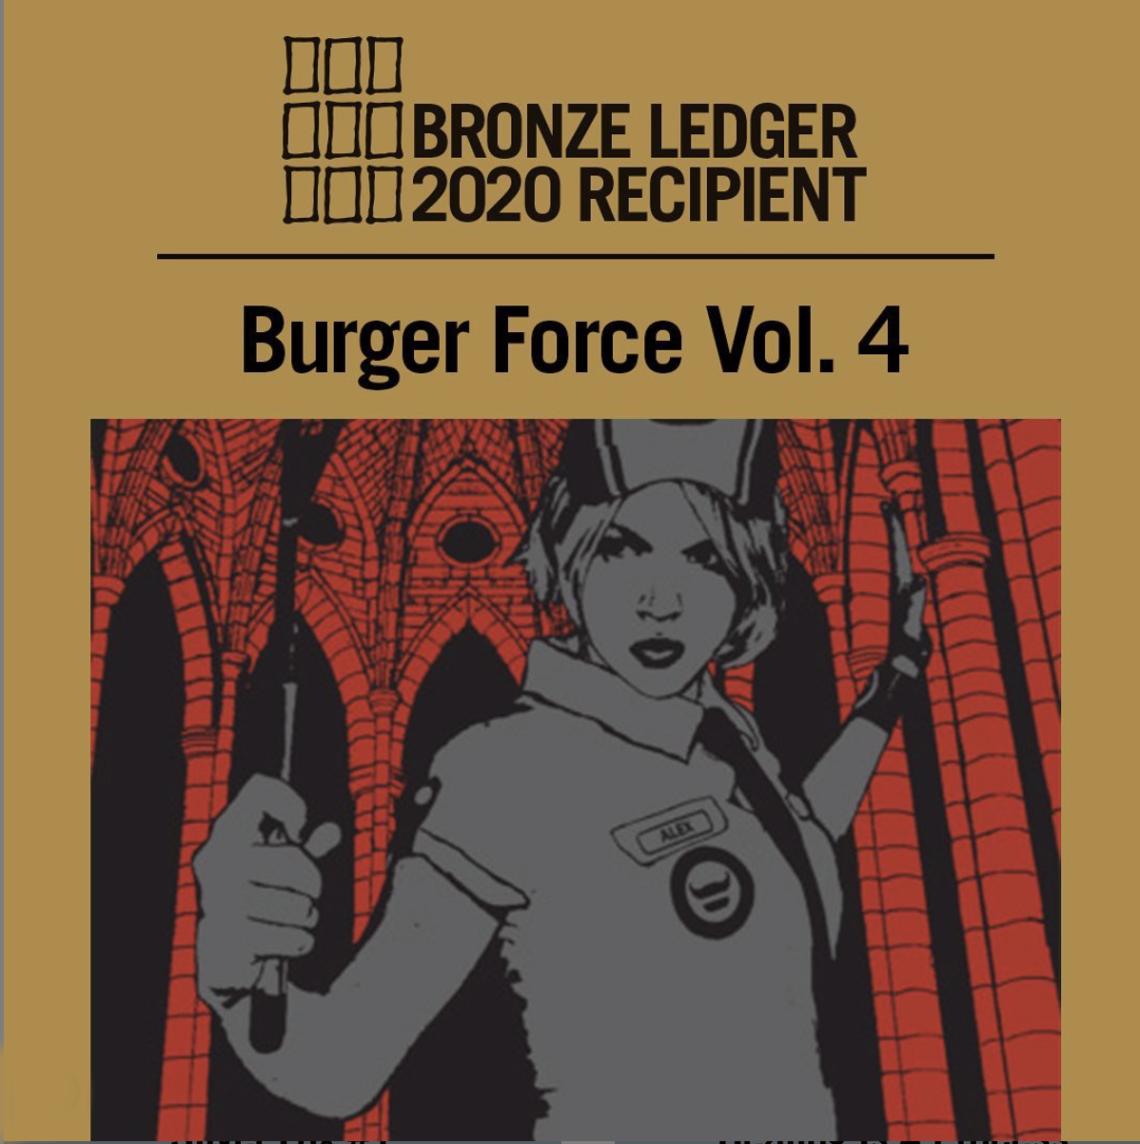 Burger Force Ledger Award announcement